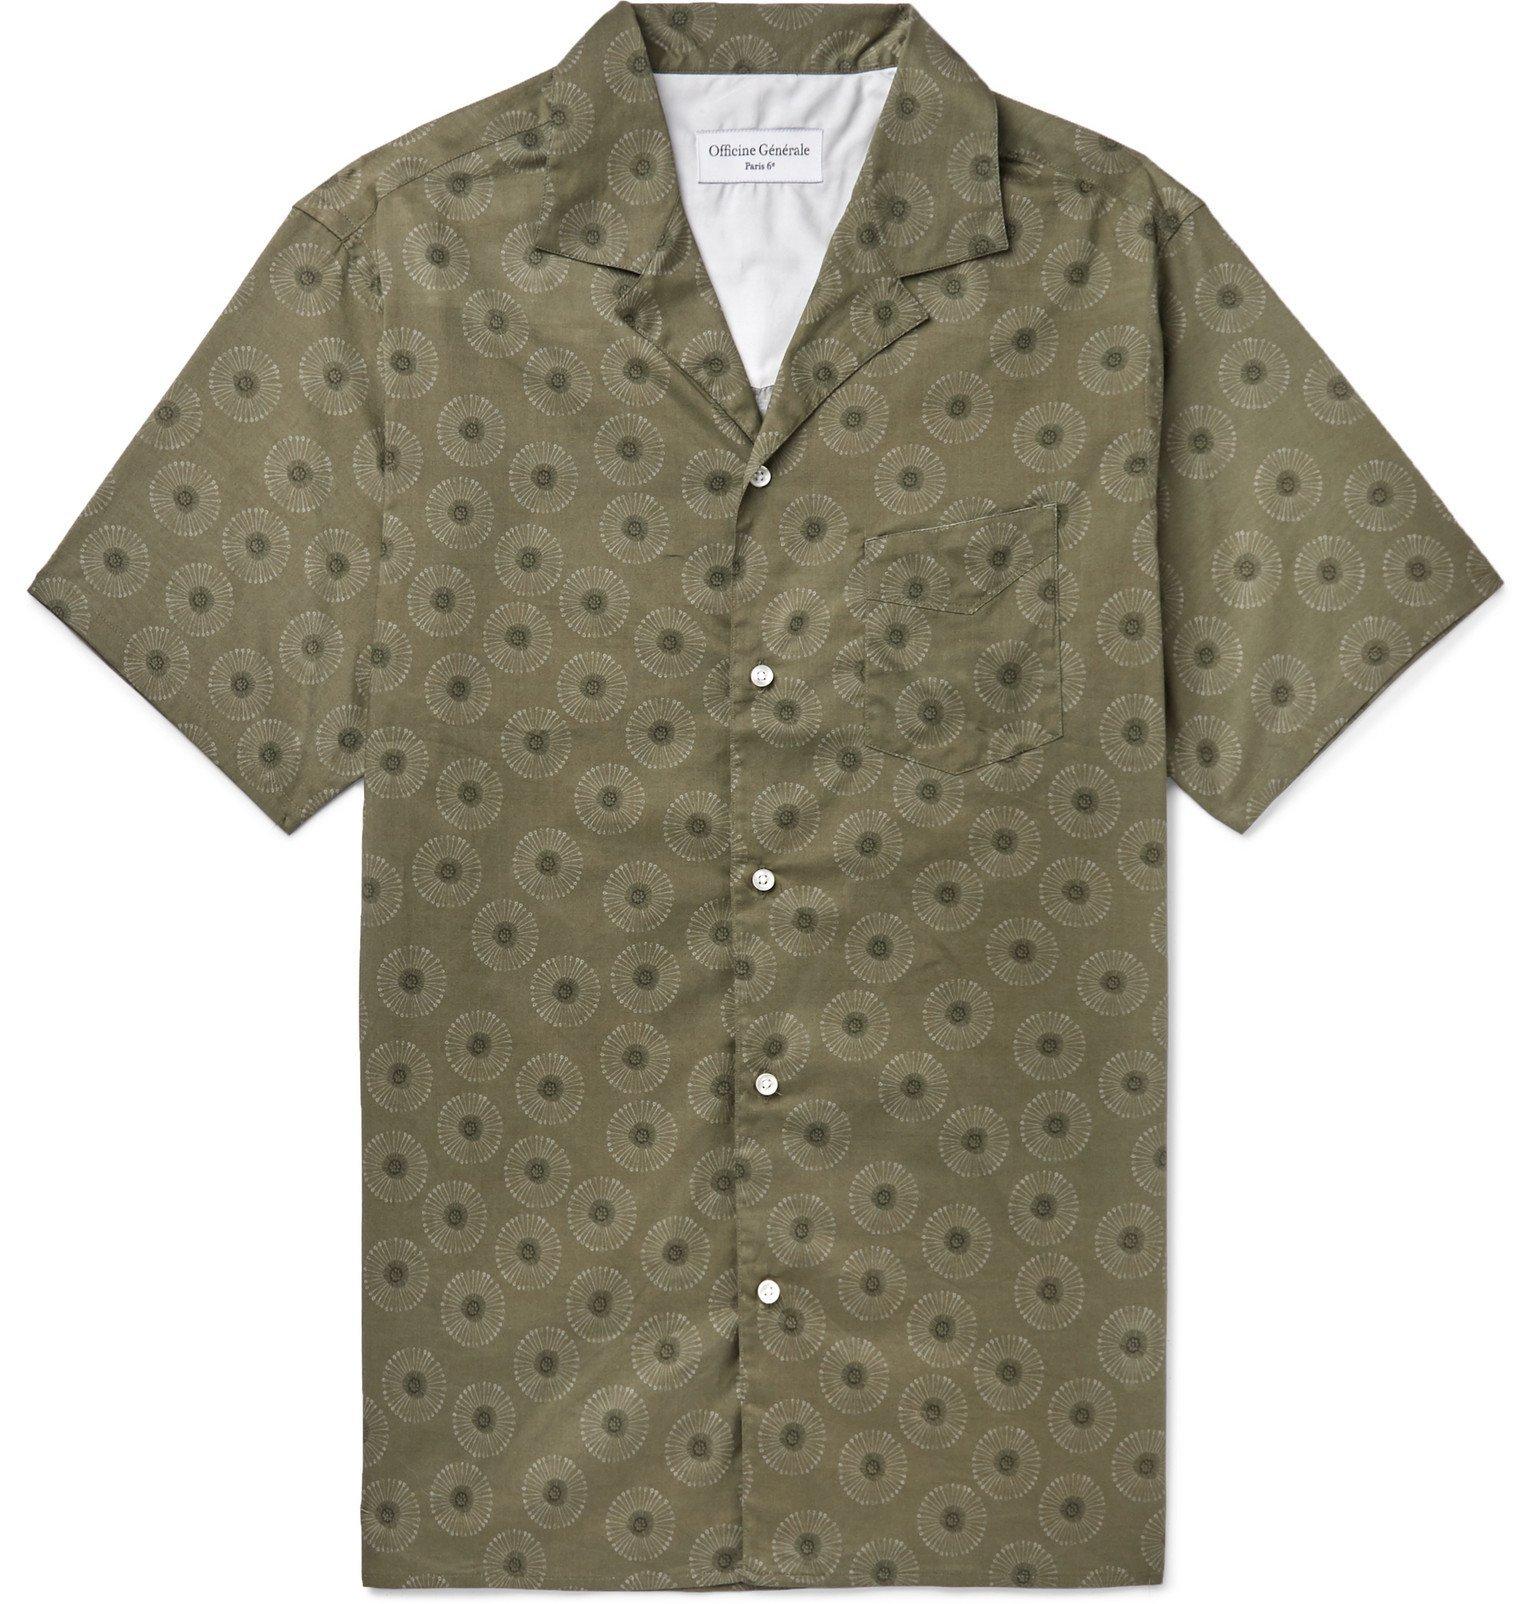 Officine Generale - Dario Camp-Collar Printed Cotton Shirt - Green